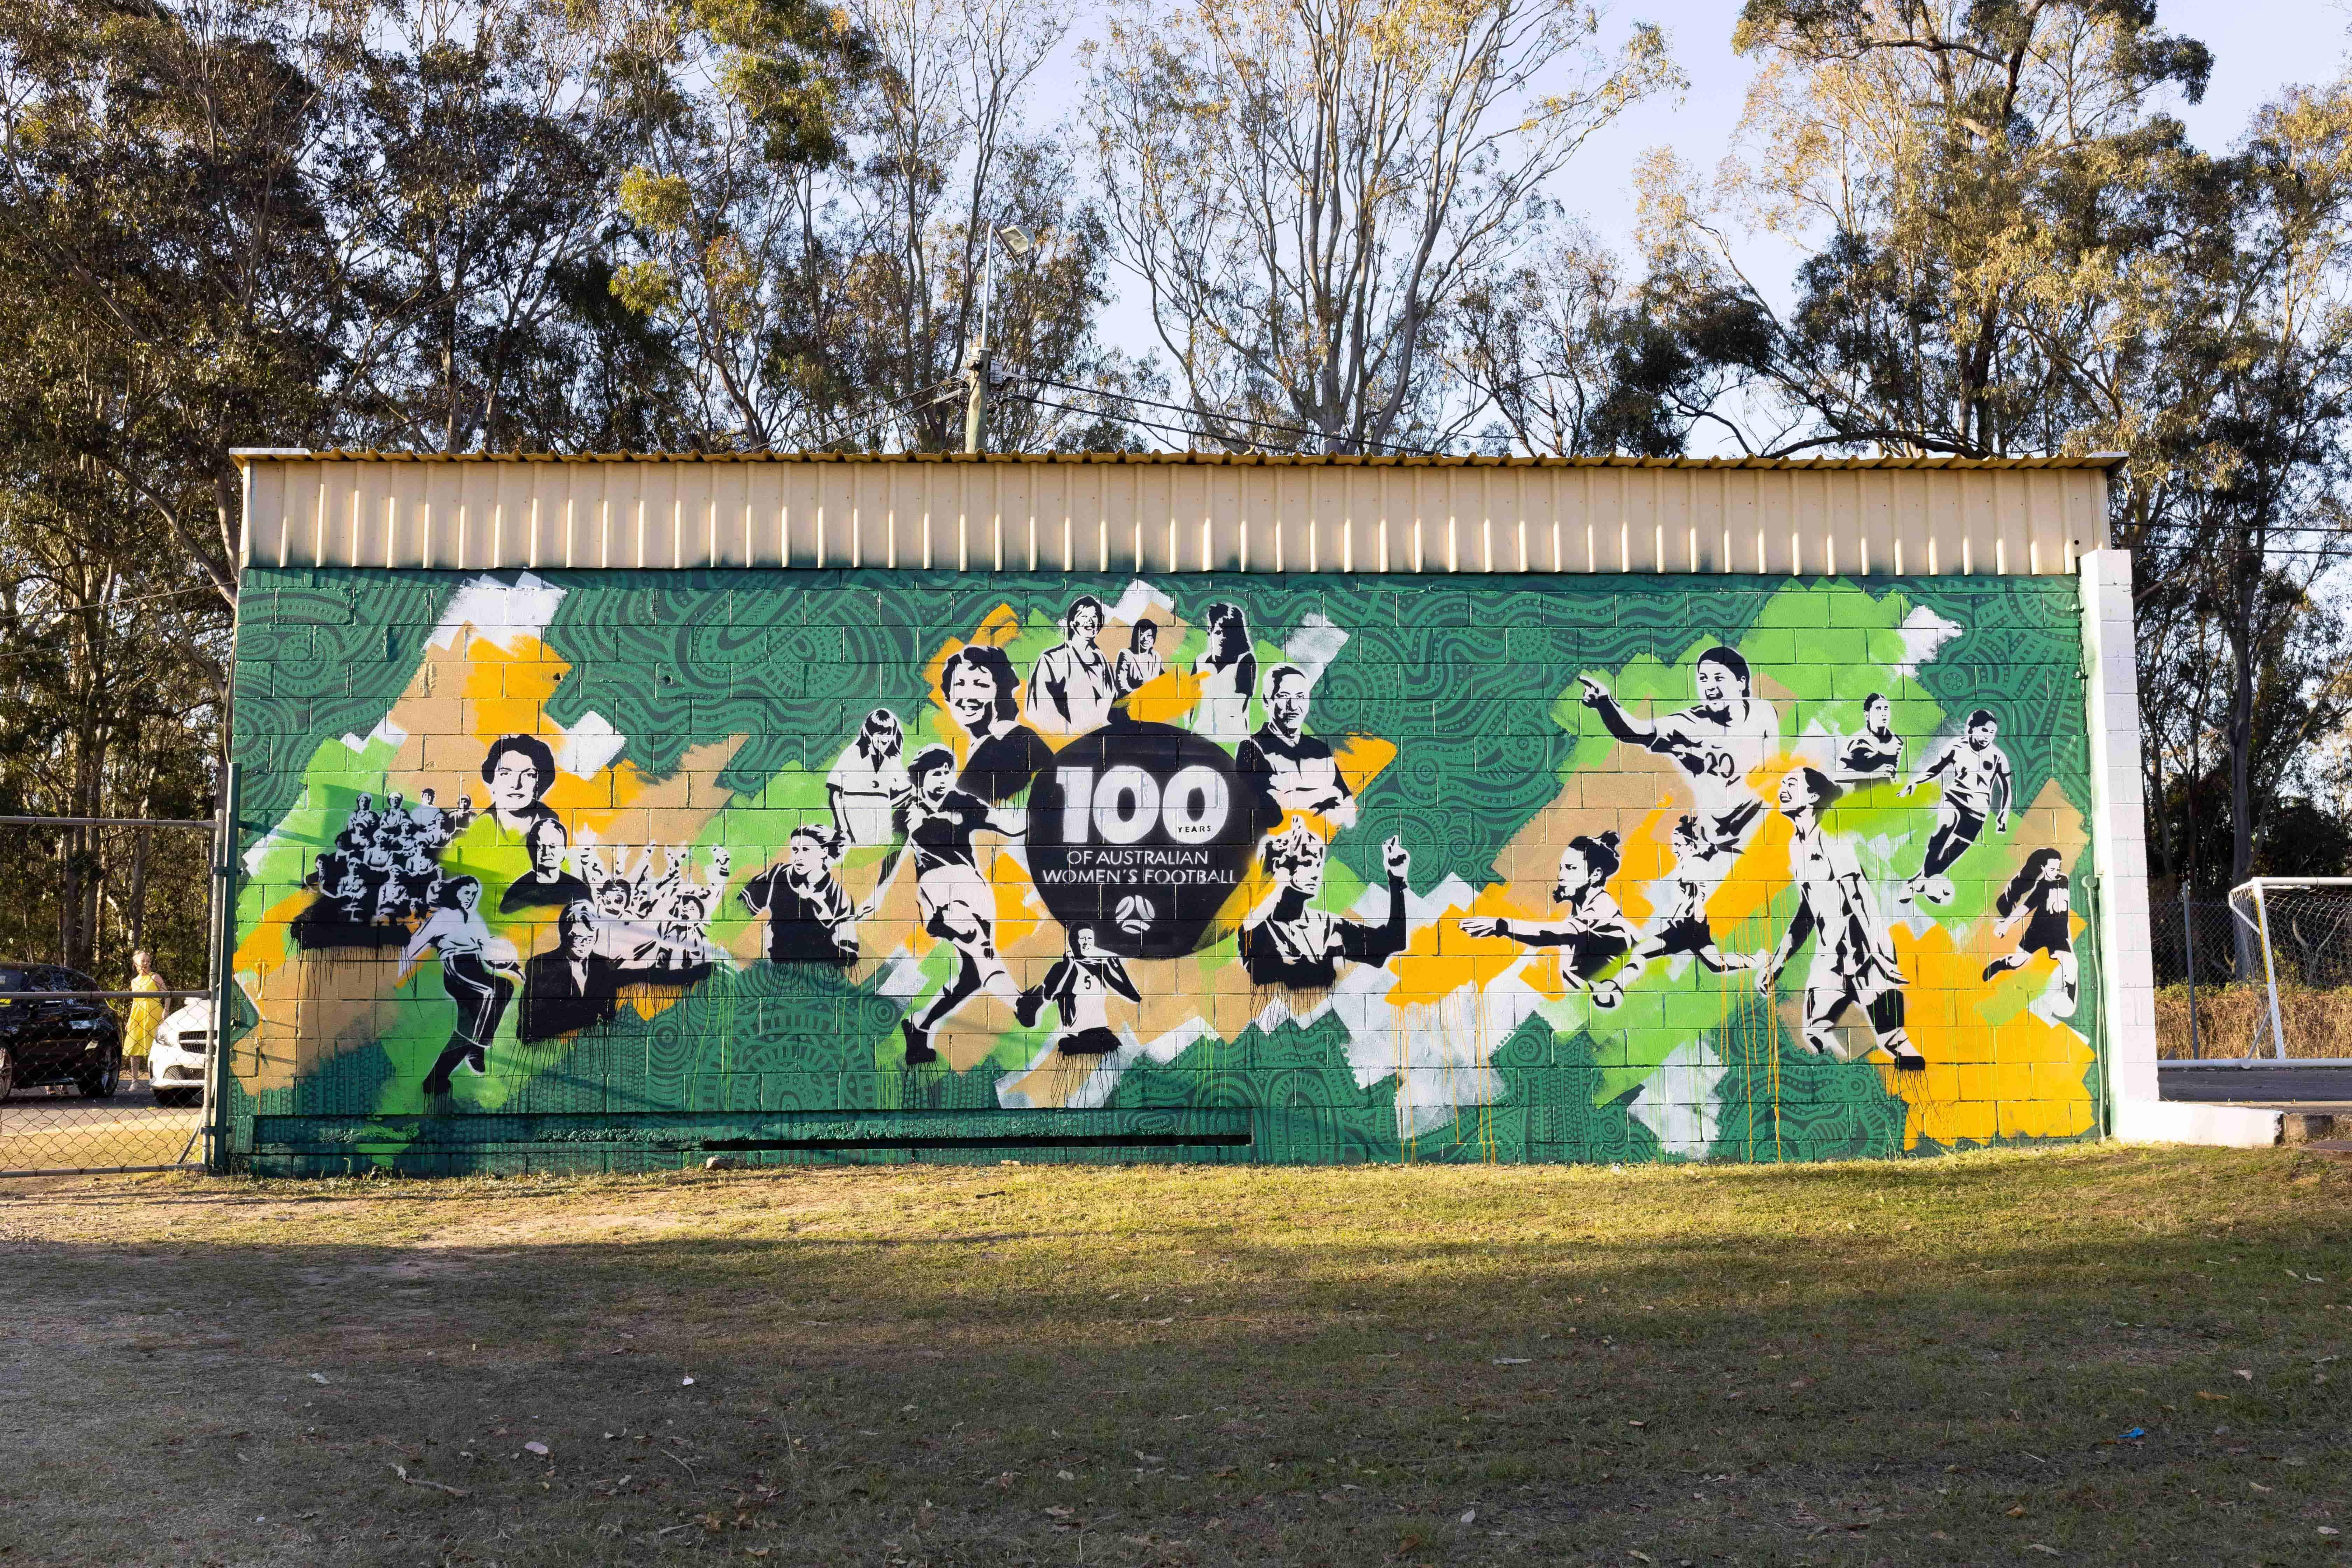 100 years of women's football wall mural